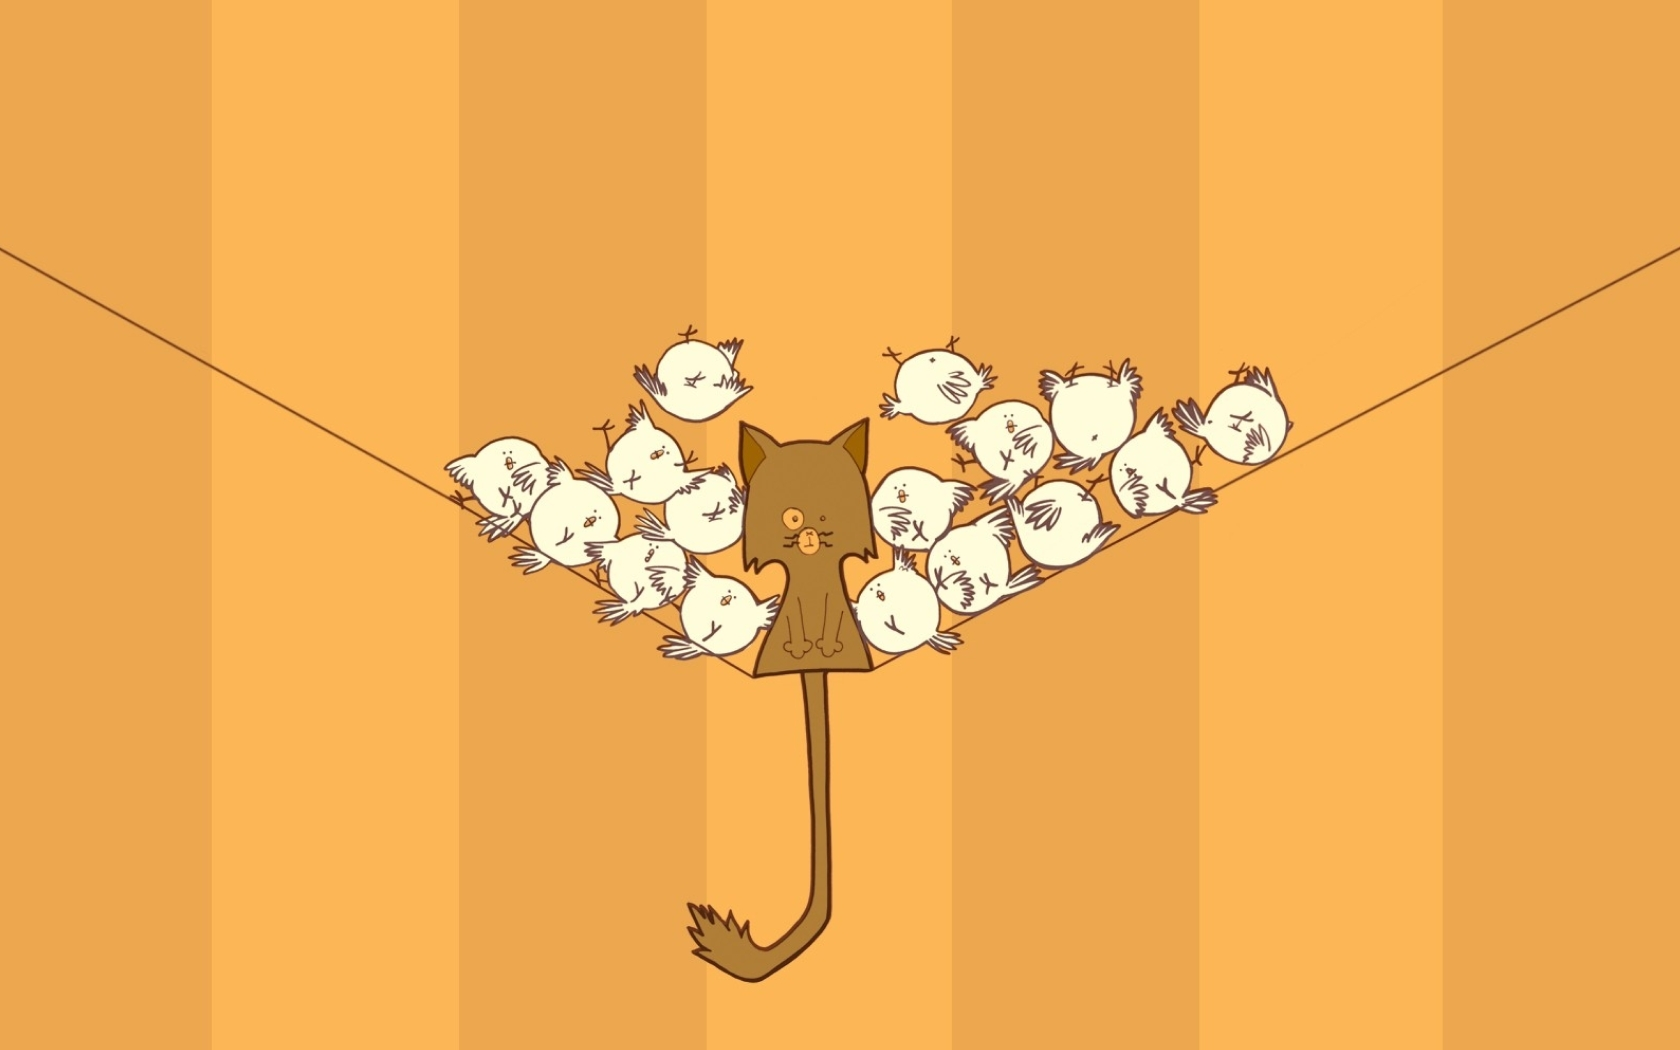 75 Cartoon Cat Wallpaper On Wallpapersafari